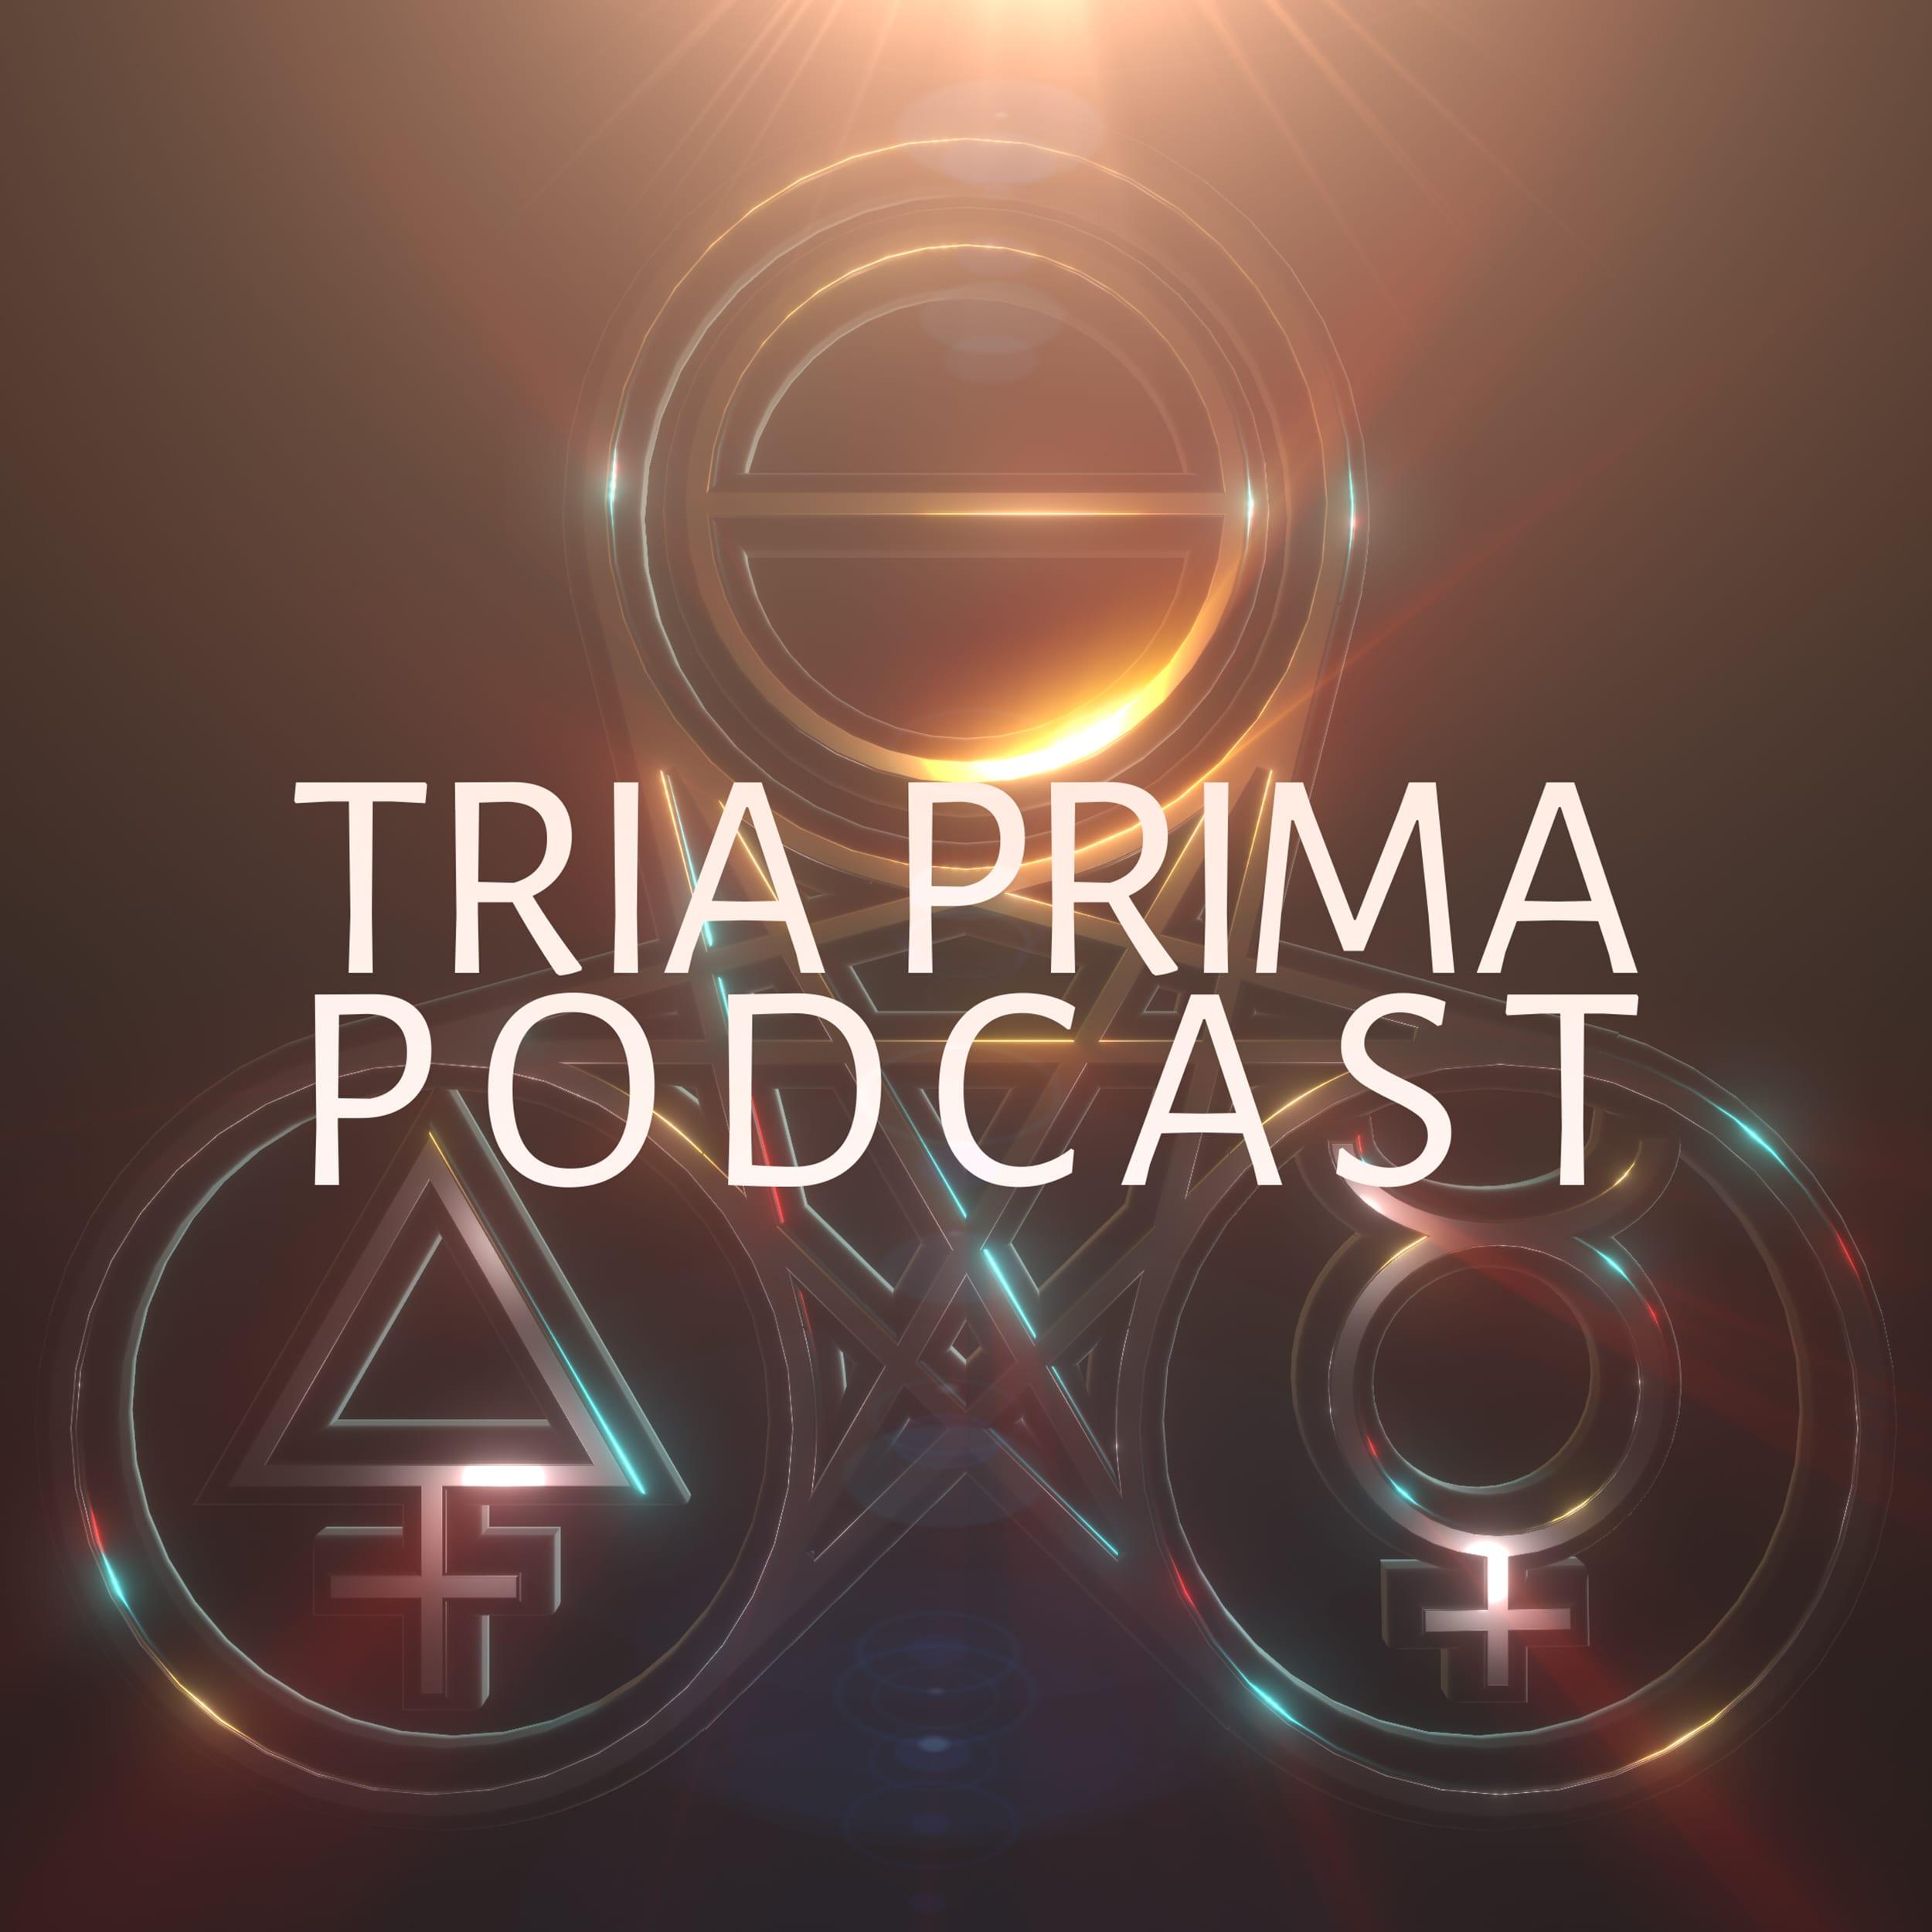 Tria Prima Podcast